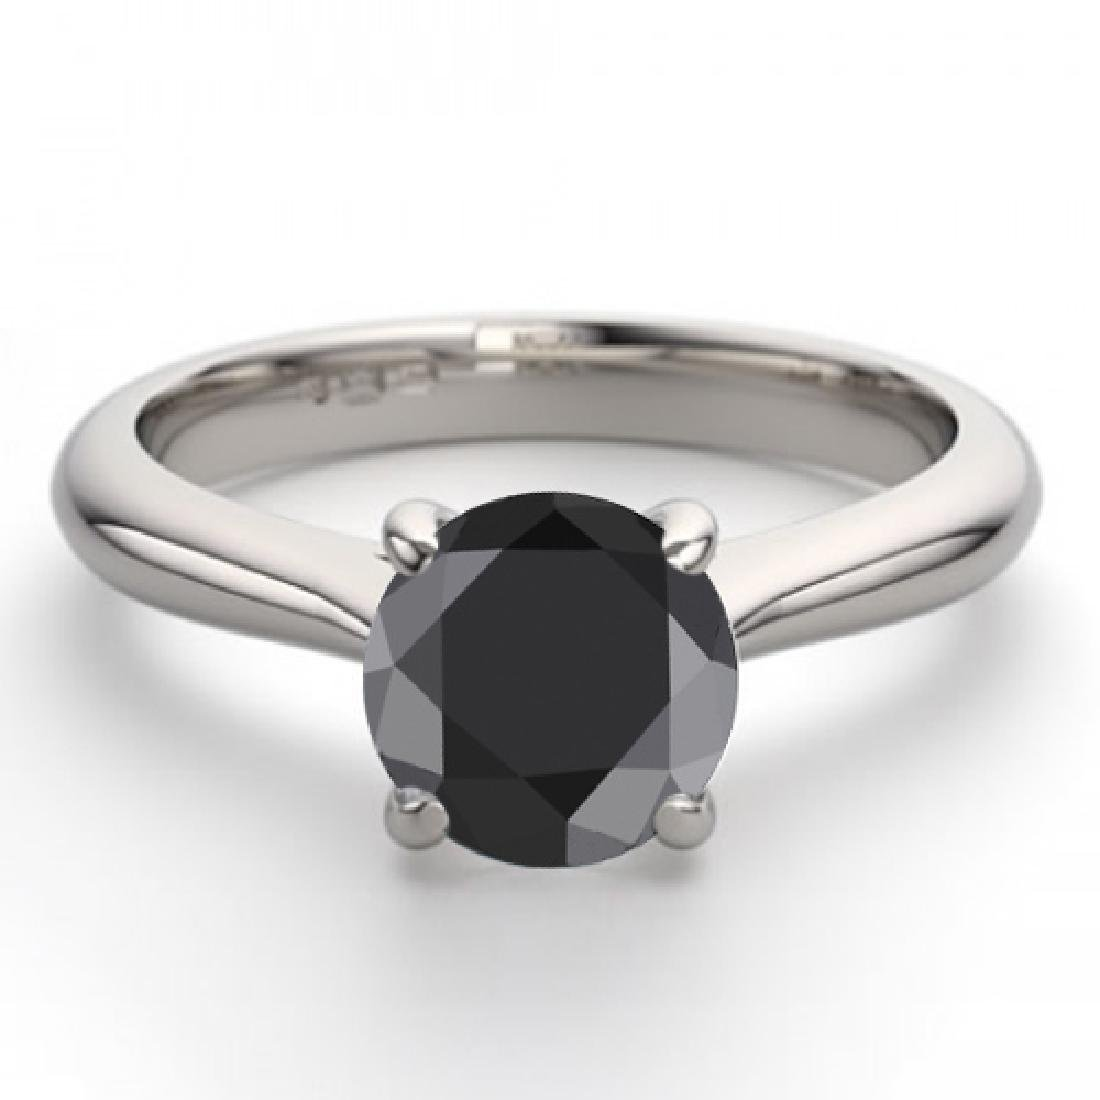 14K White Gold Jewelry 1.52 ctw Black Diamond Solitaire